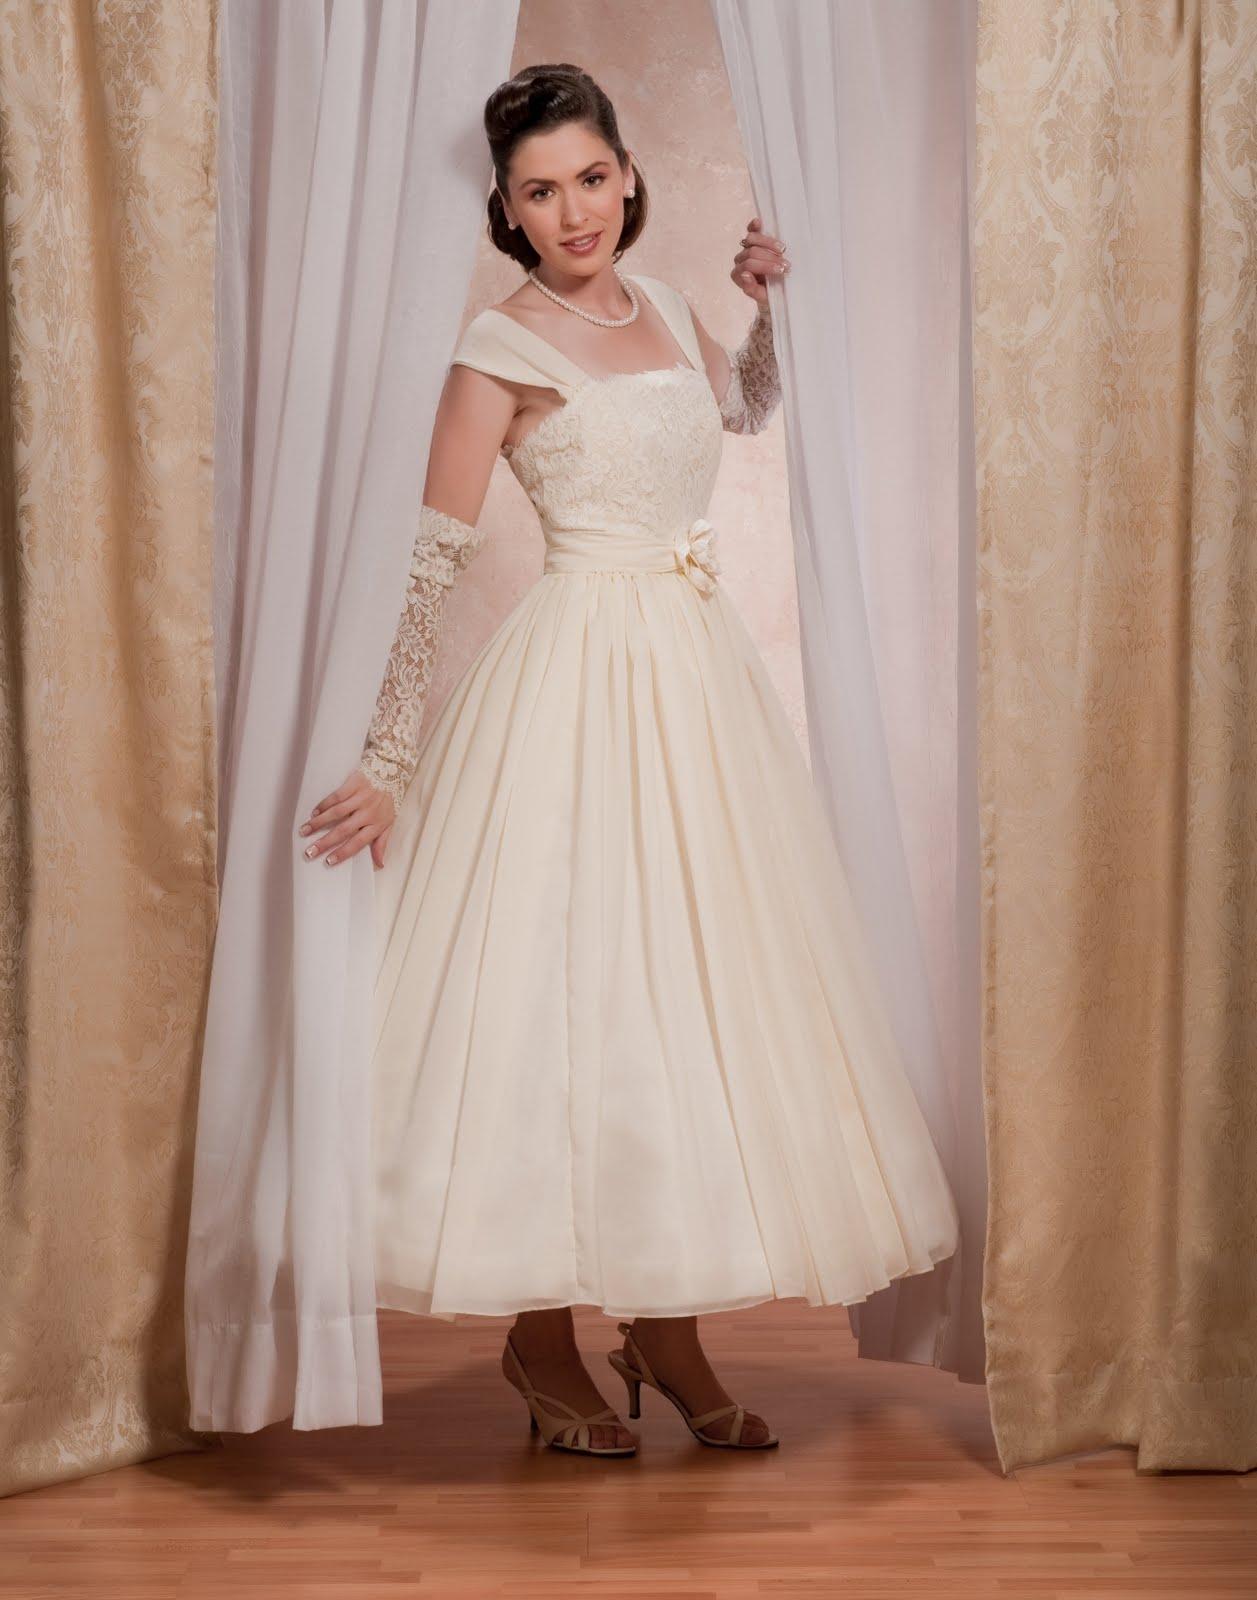 1950s Wedding Makeup Viewing Gallery